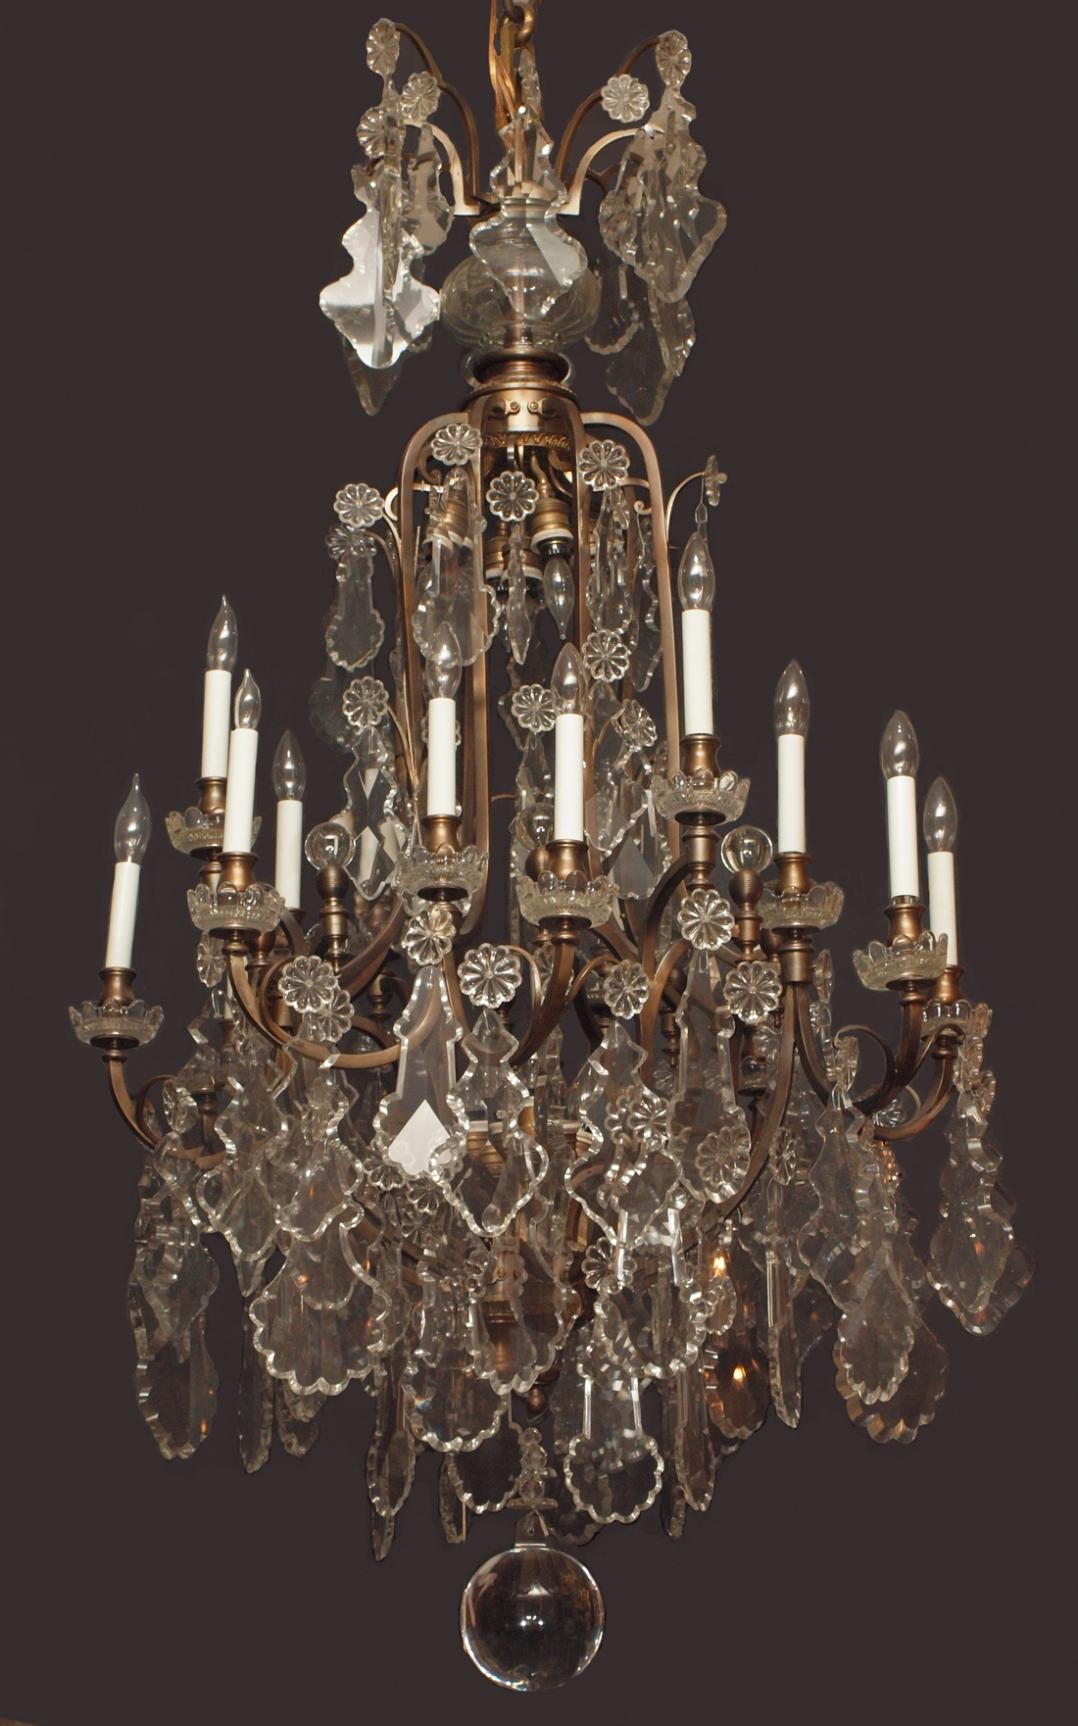 Recent Home Decor: Chandeliers Design : Black Glass Chandelier Chandelier Within Black Glass Chandeliers (View 19 of 20)